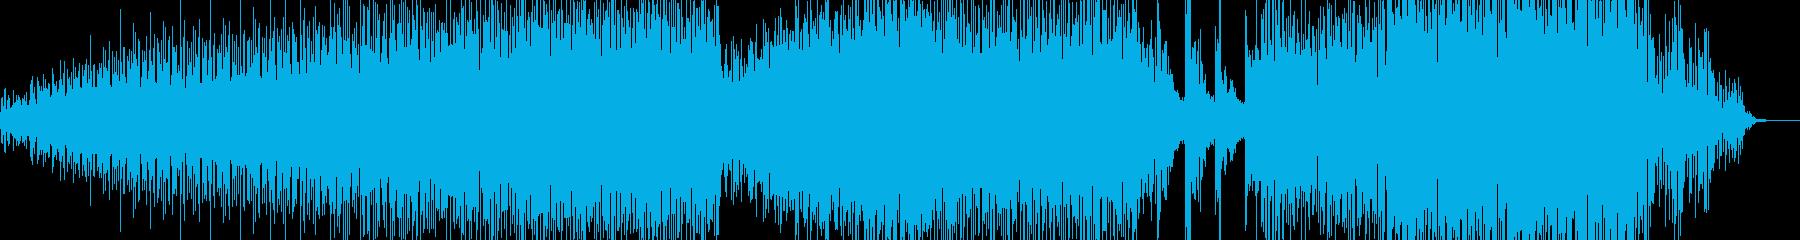 Synthetic motionの再生済みの波形